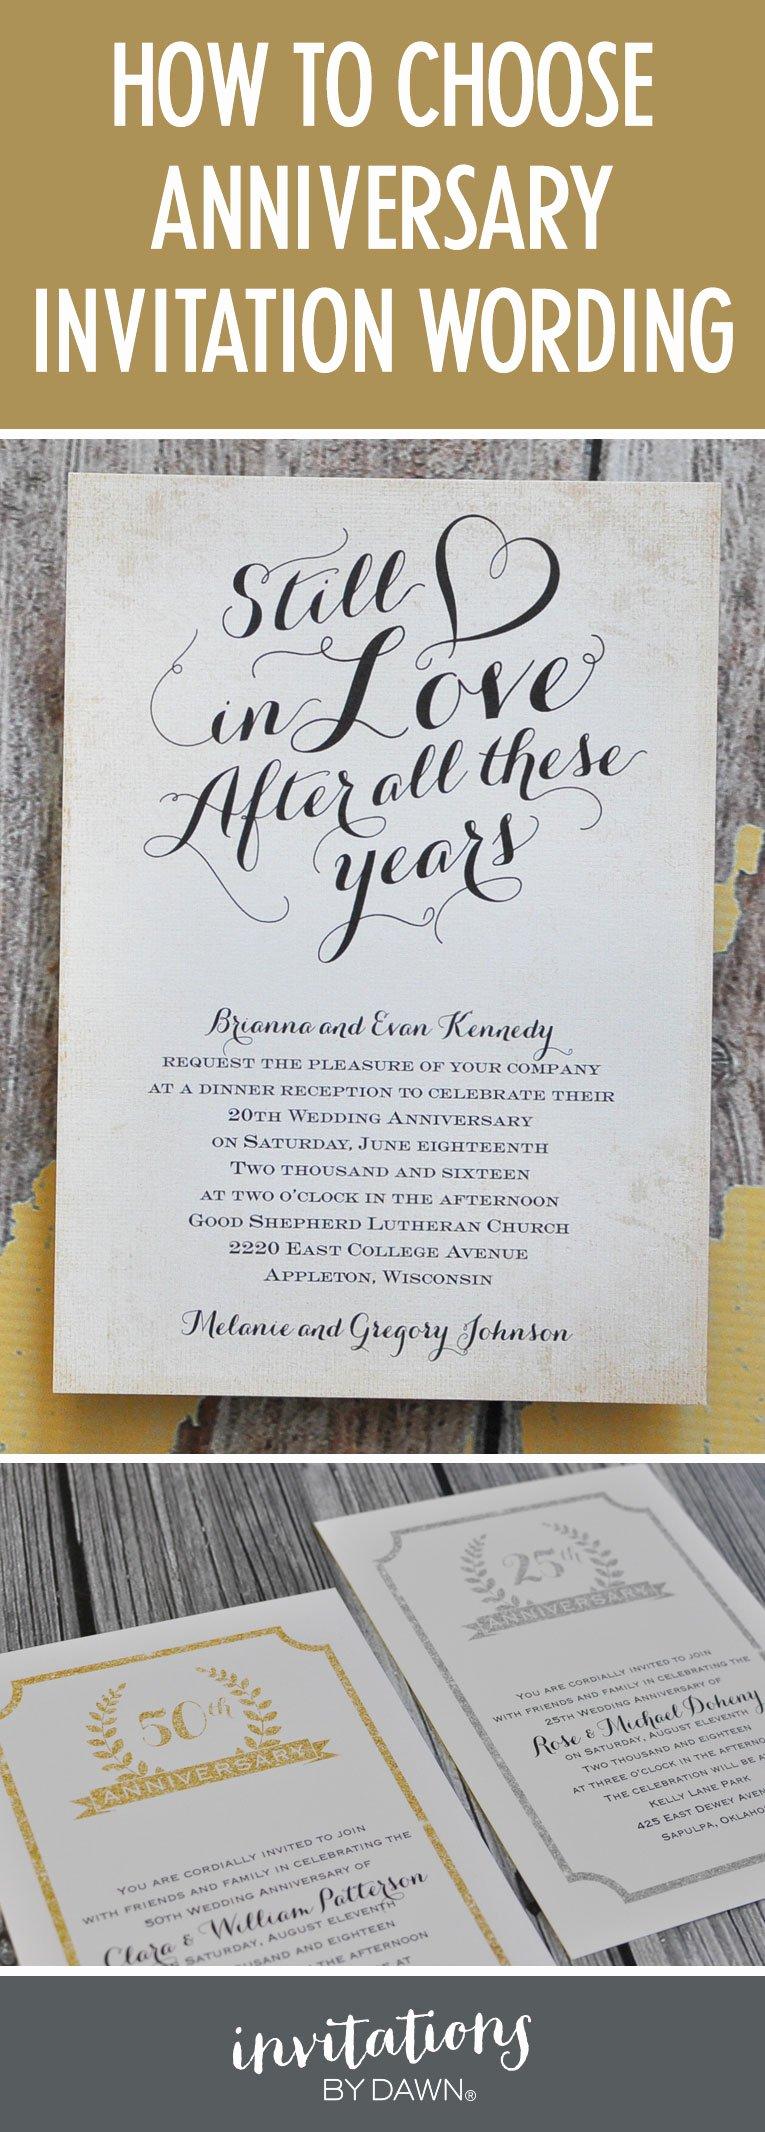 Wedding Anniversary Invitation Template Lovely Finding the Right Wedding Anniversary Invitation Wording